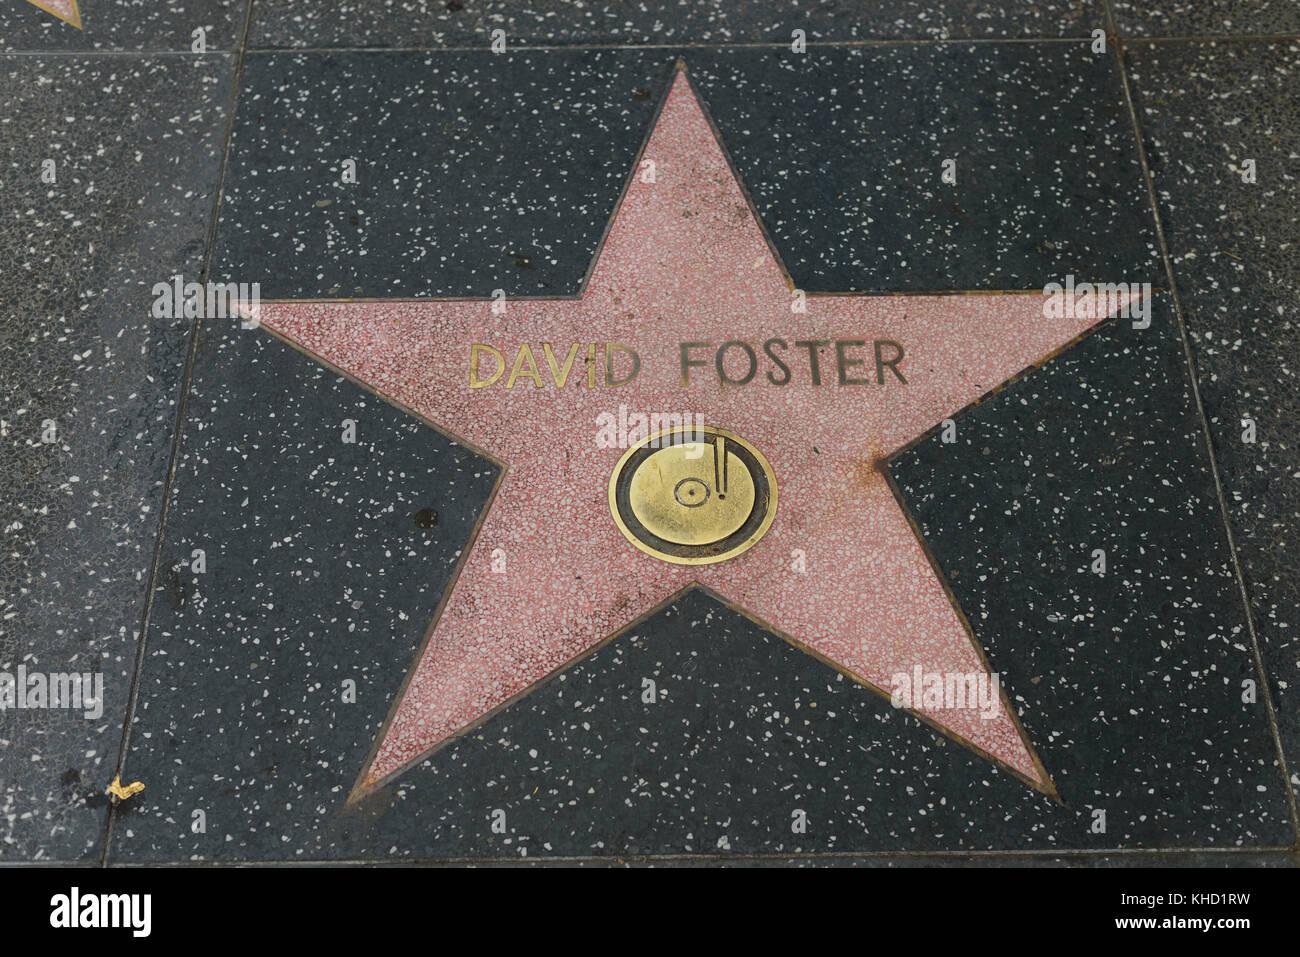 Car Park Near Hollywood Walk Of Fame